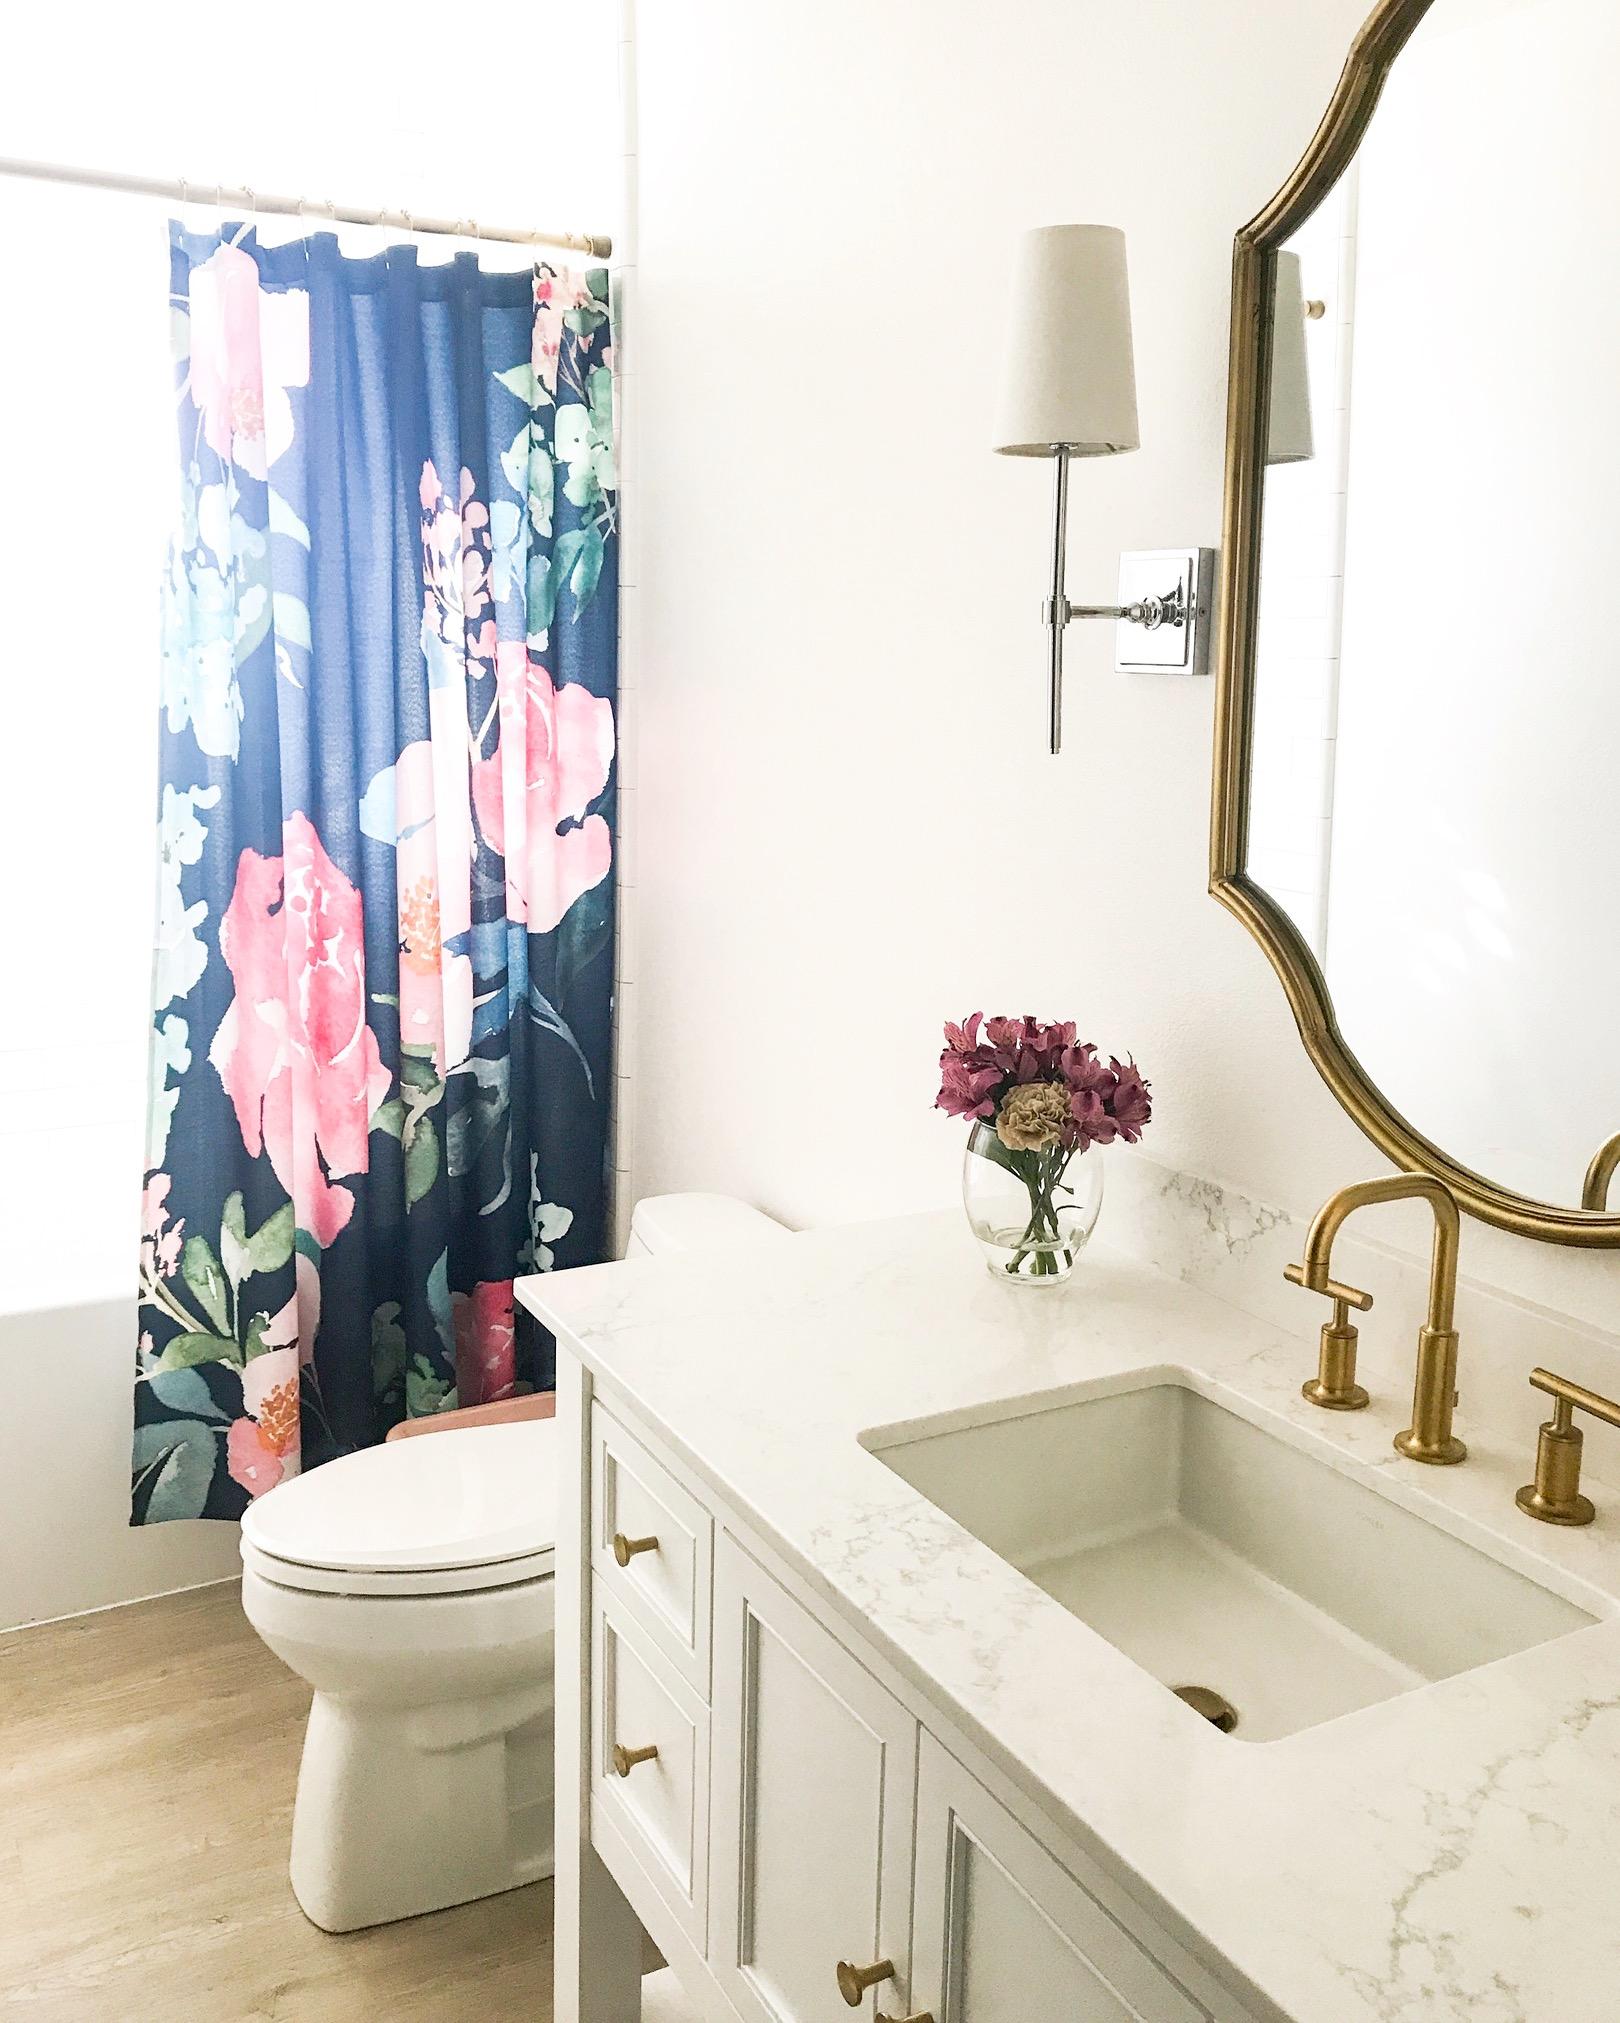 New House Design Inspiration for the Bathrooms: 1111 Light Lane